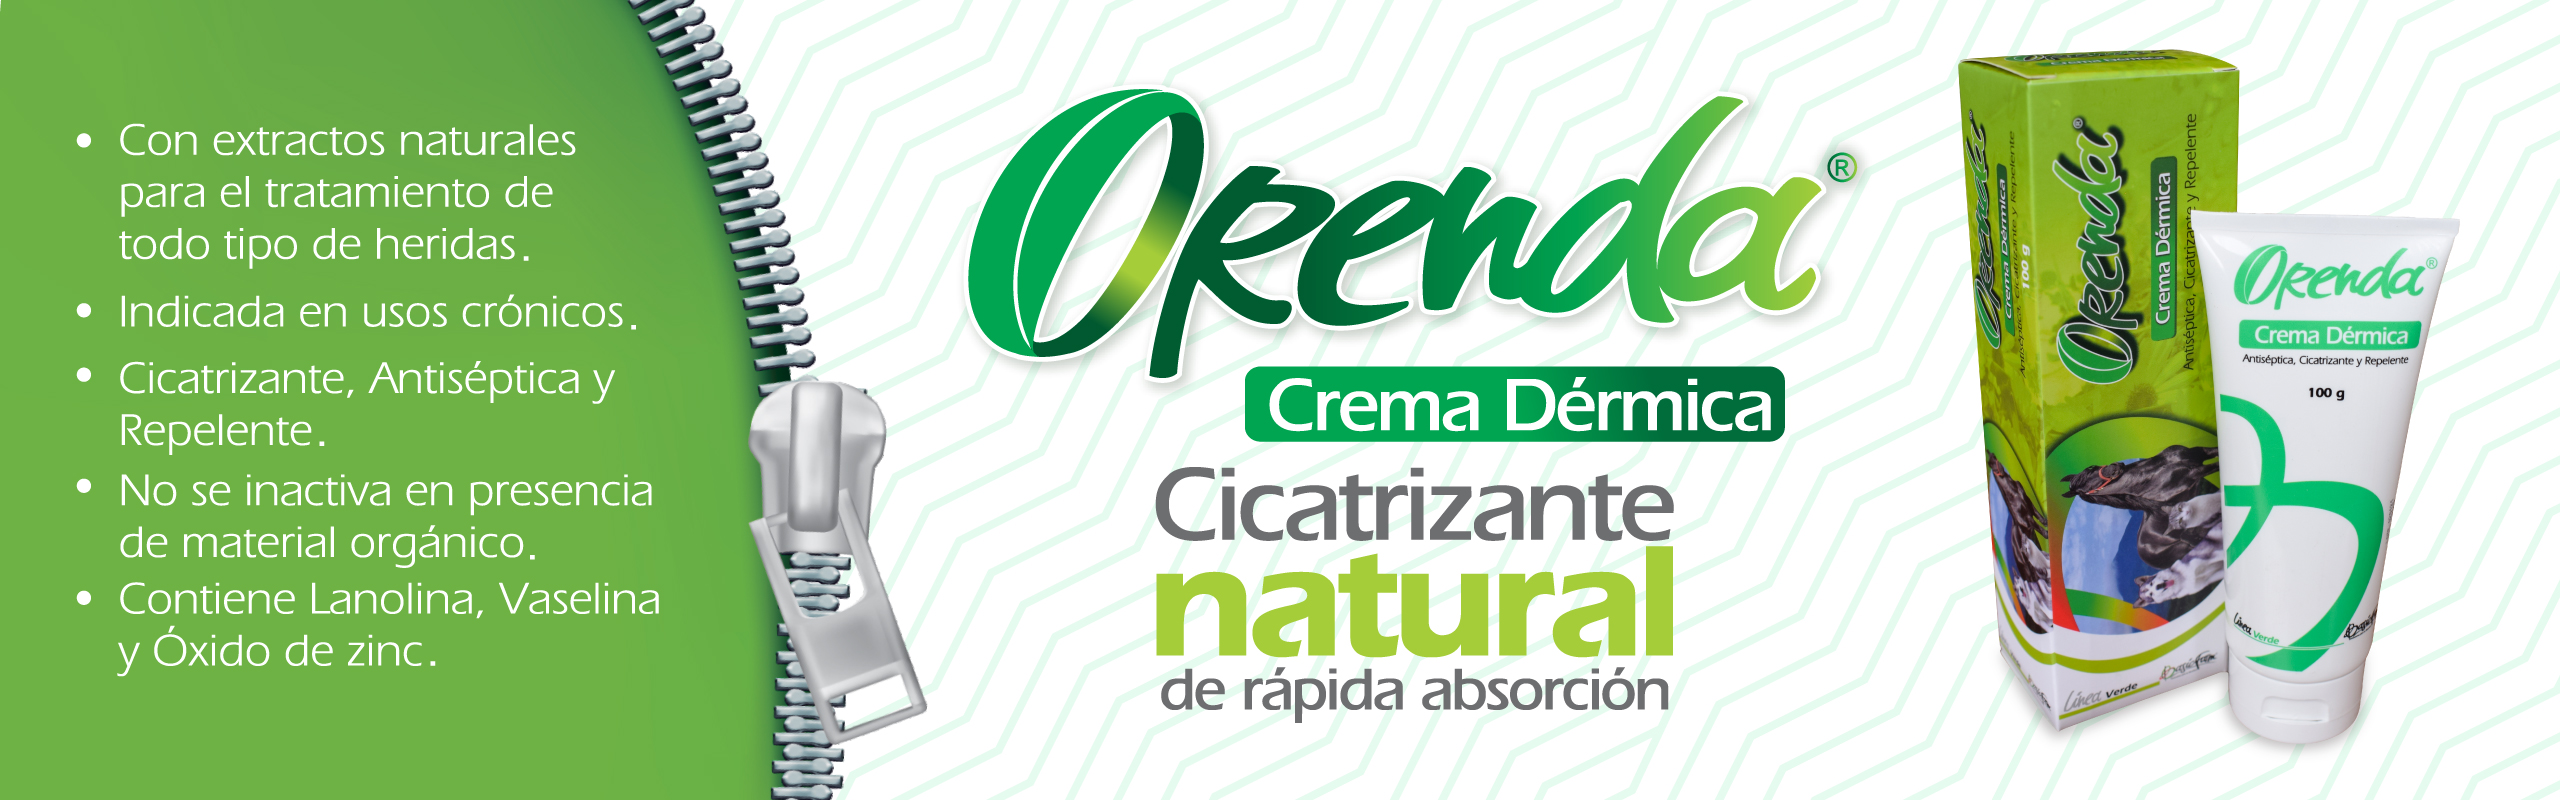 Orenda Banner Crema